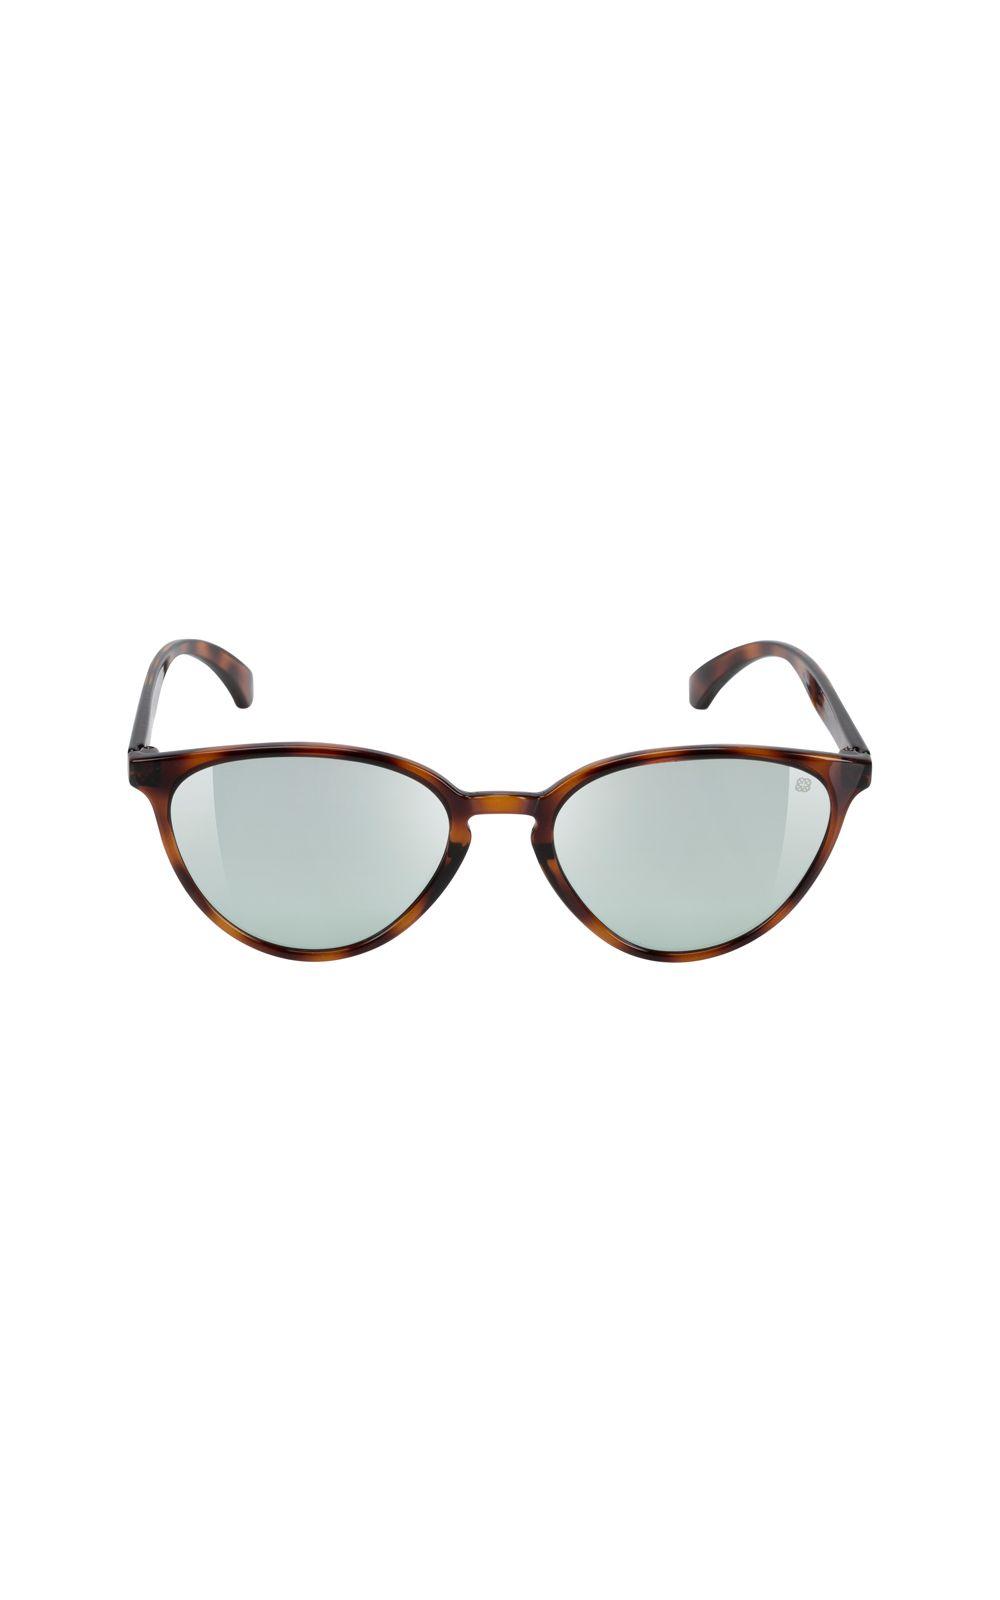 Foto 1 - Óculos Euro Geometric Trendy Tartaruga E0040F2180/8K